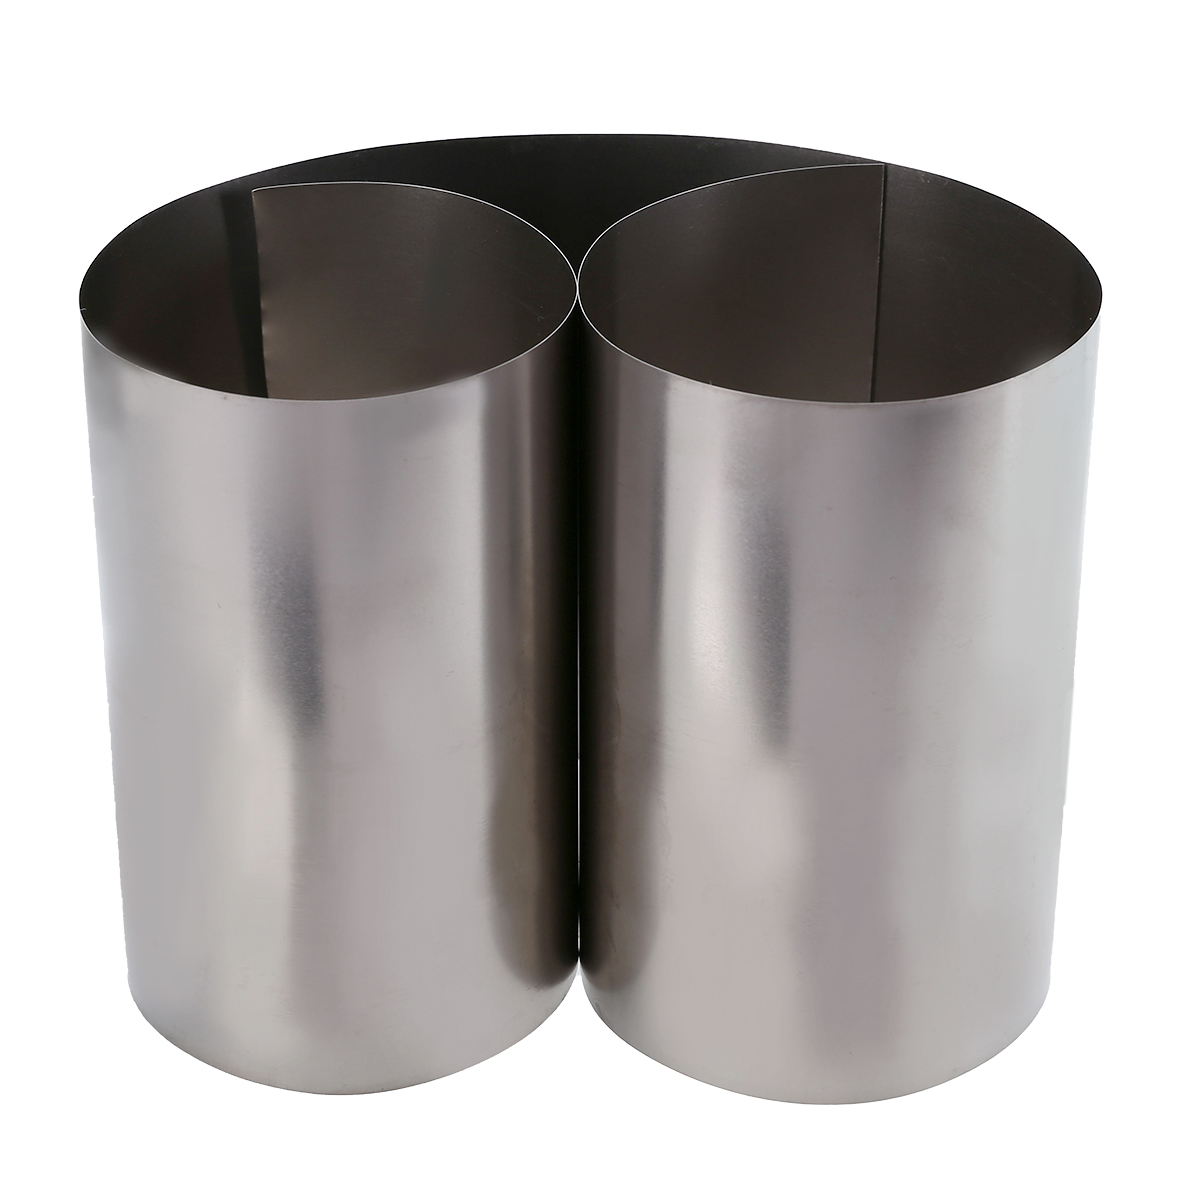 Mayitr 1pc Silver Thin Titanium Sheet Gr2 Titanium Foil  High Purity Ti Metal Square Plate Sheet Foil Craft 0.1x100x500mm